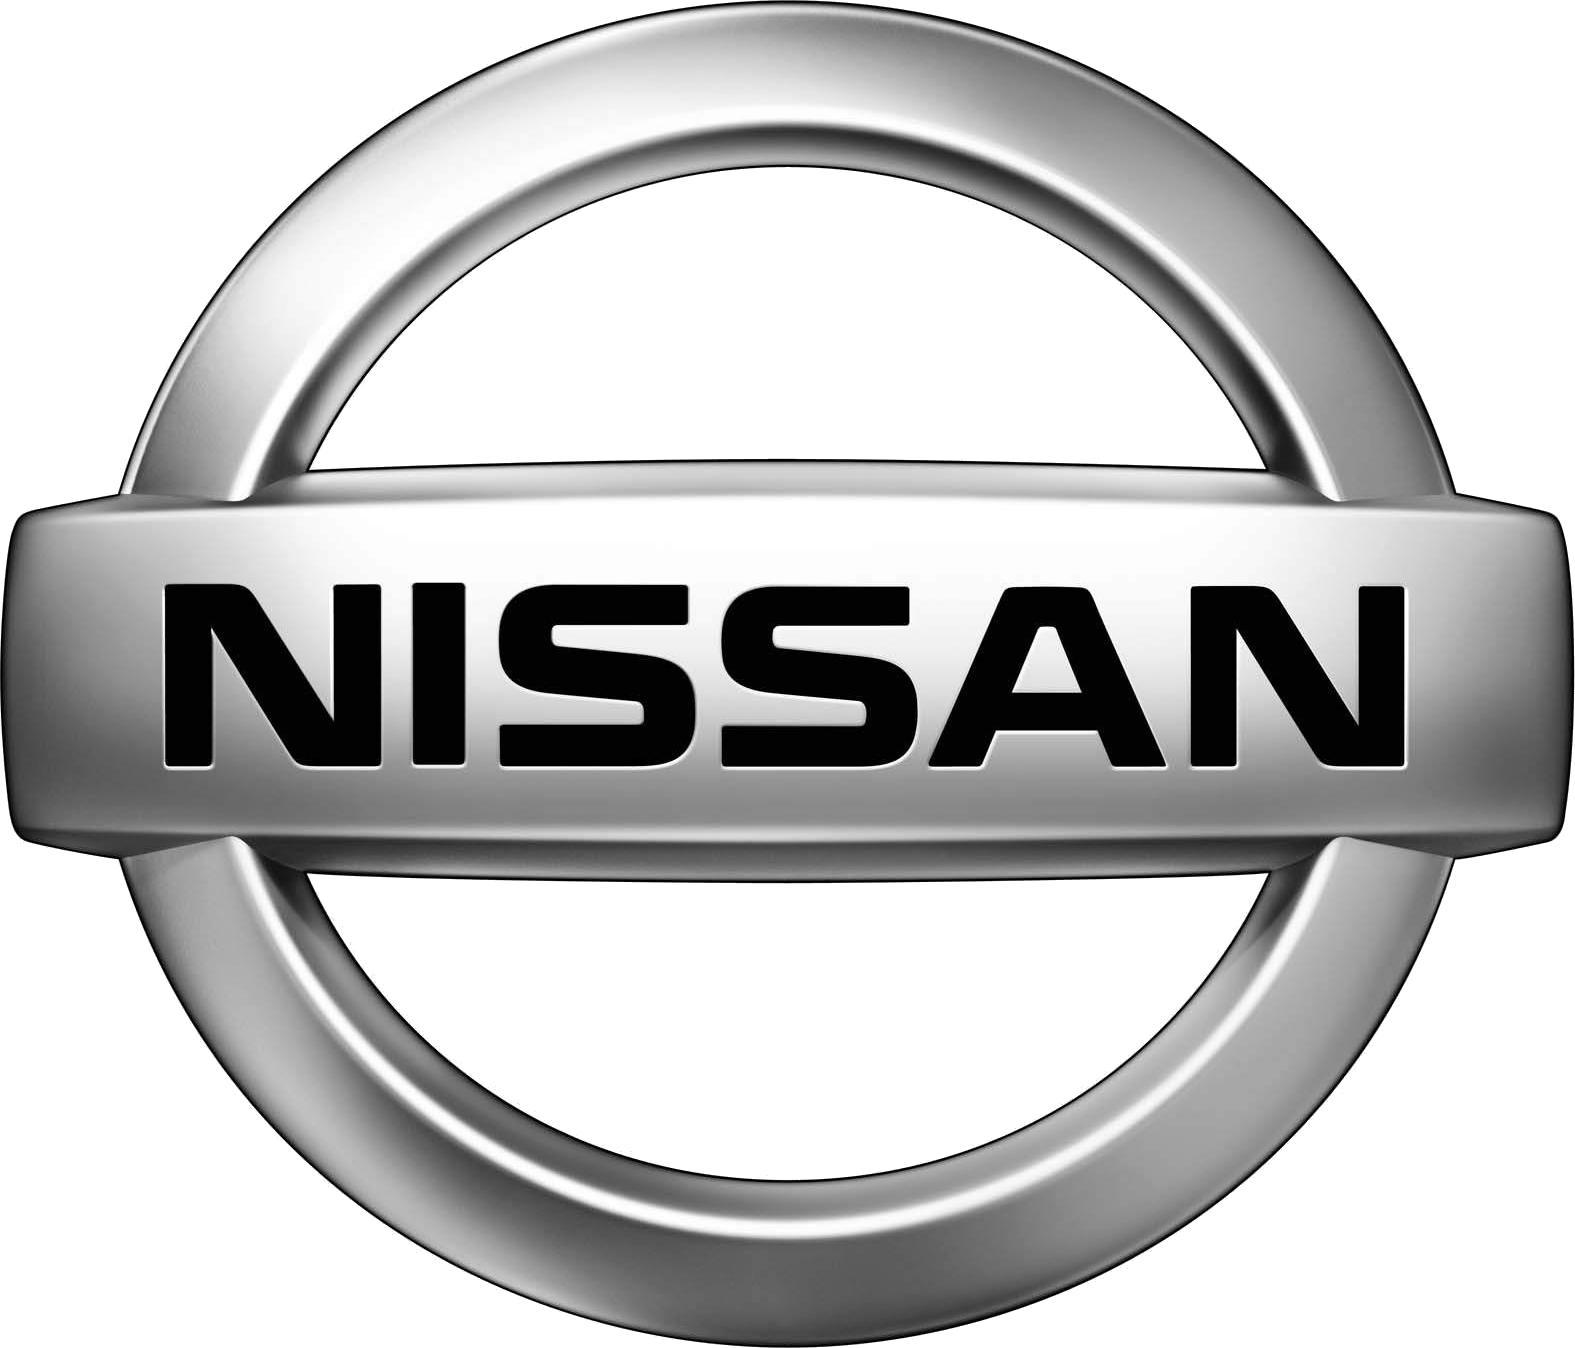 Docar-s: Nissan Logo